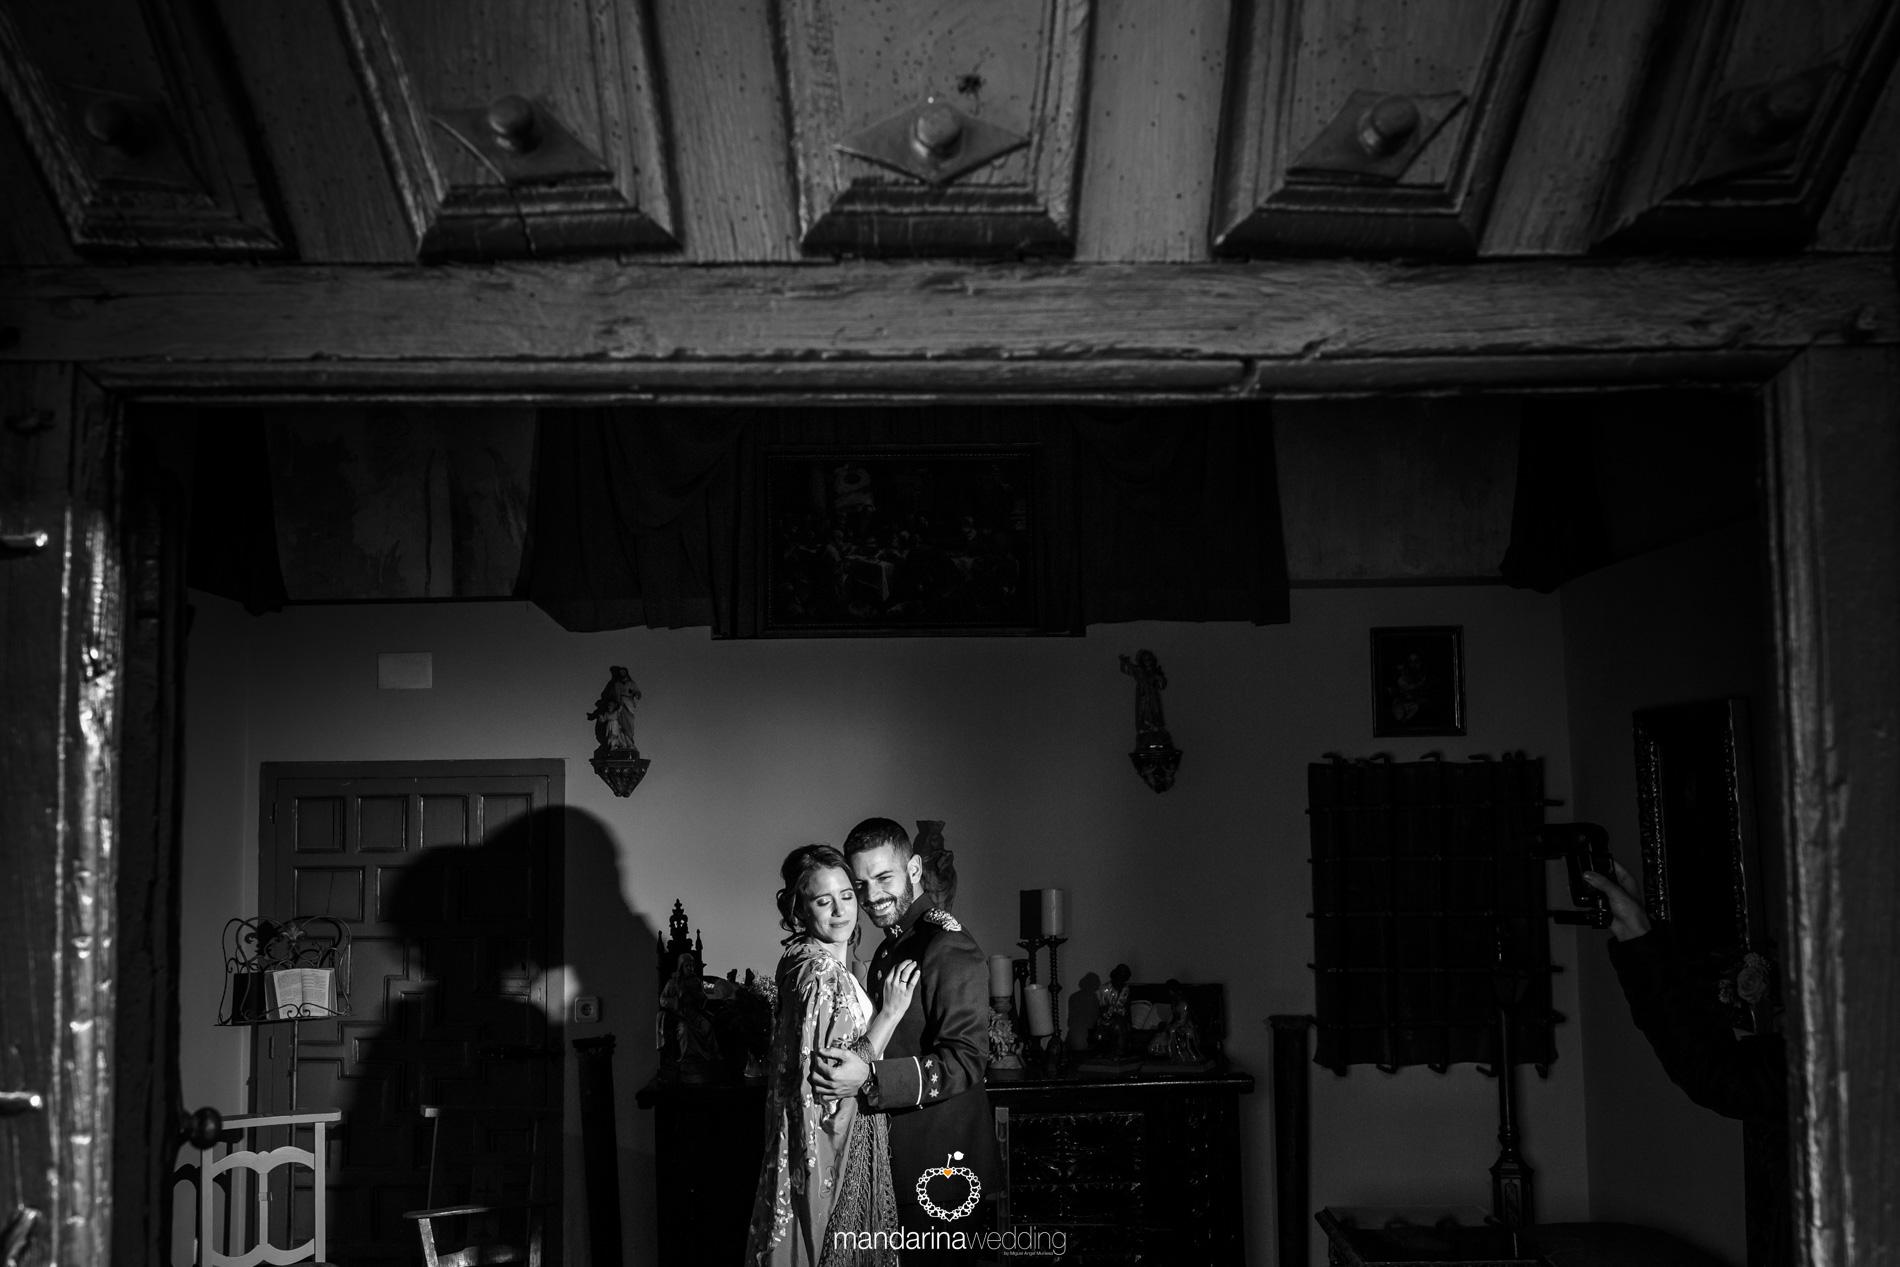 mandarina wedding, fotografos de boda, fotografo boda soria, fotografo boda barcelona, fotografo boda Madrid, fotógrafo boda lerida_28